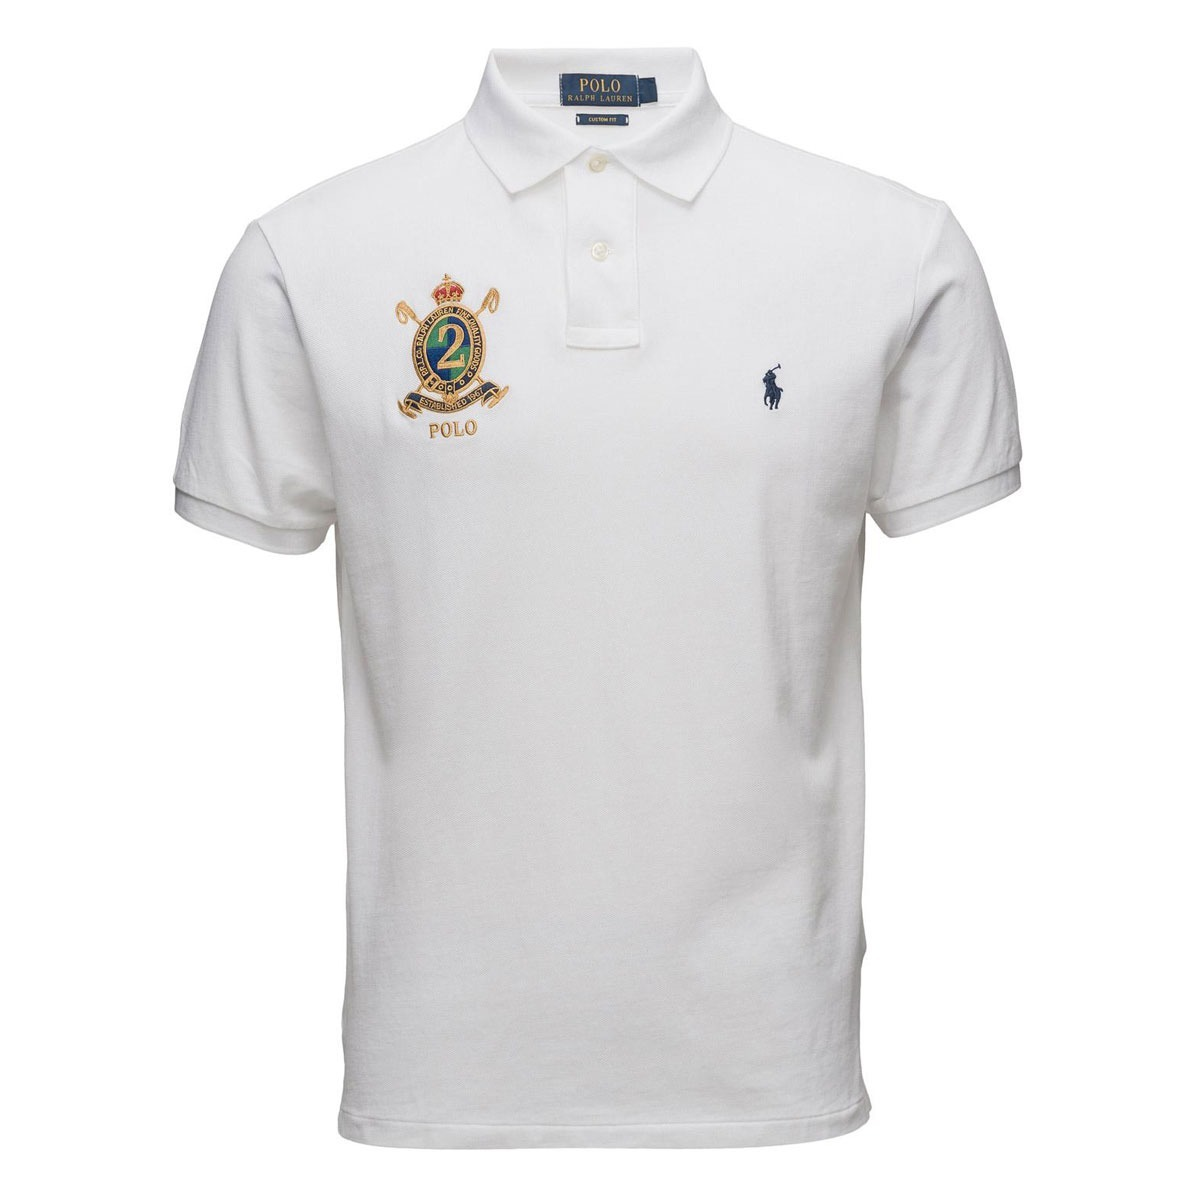 0b59ce1e52ba9 ... low cost camisa polo ralph lauren masculina tam gg e xxl p2. carregando  zoom.